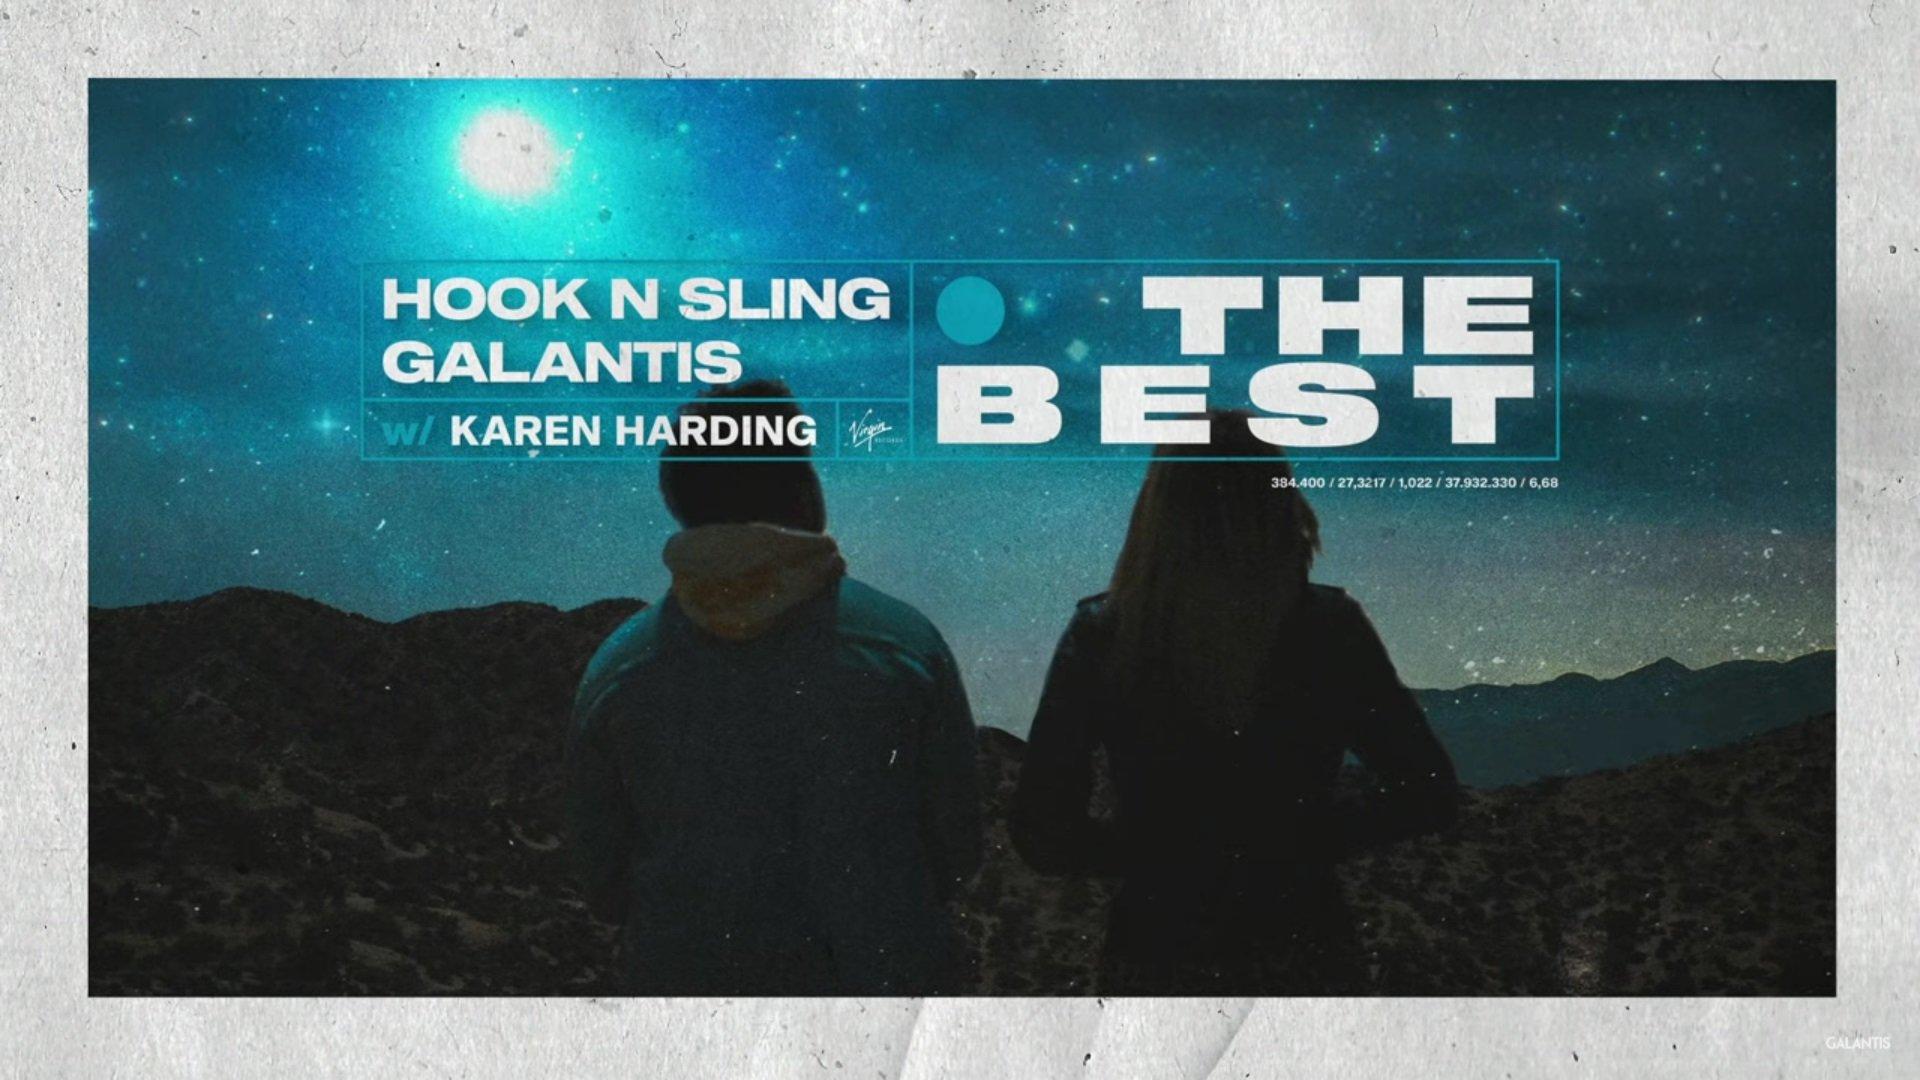 Hook N Sling Galantis Karen Harding The Best